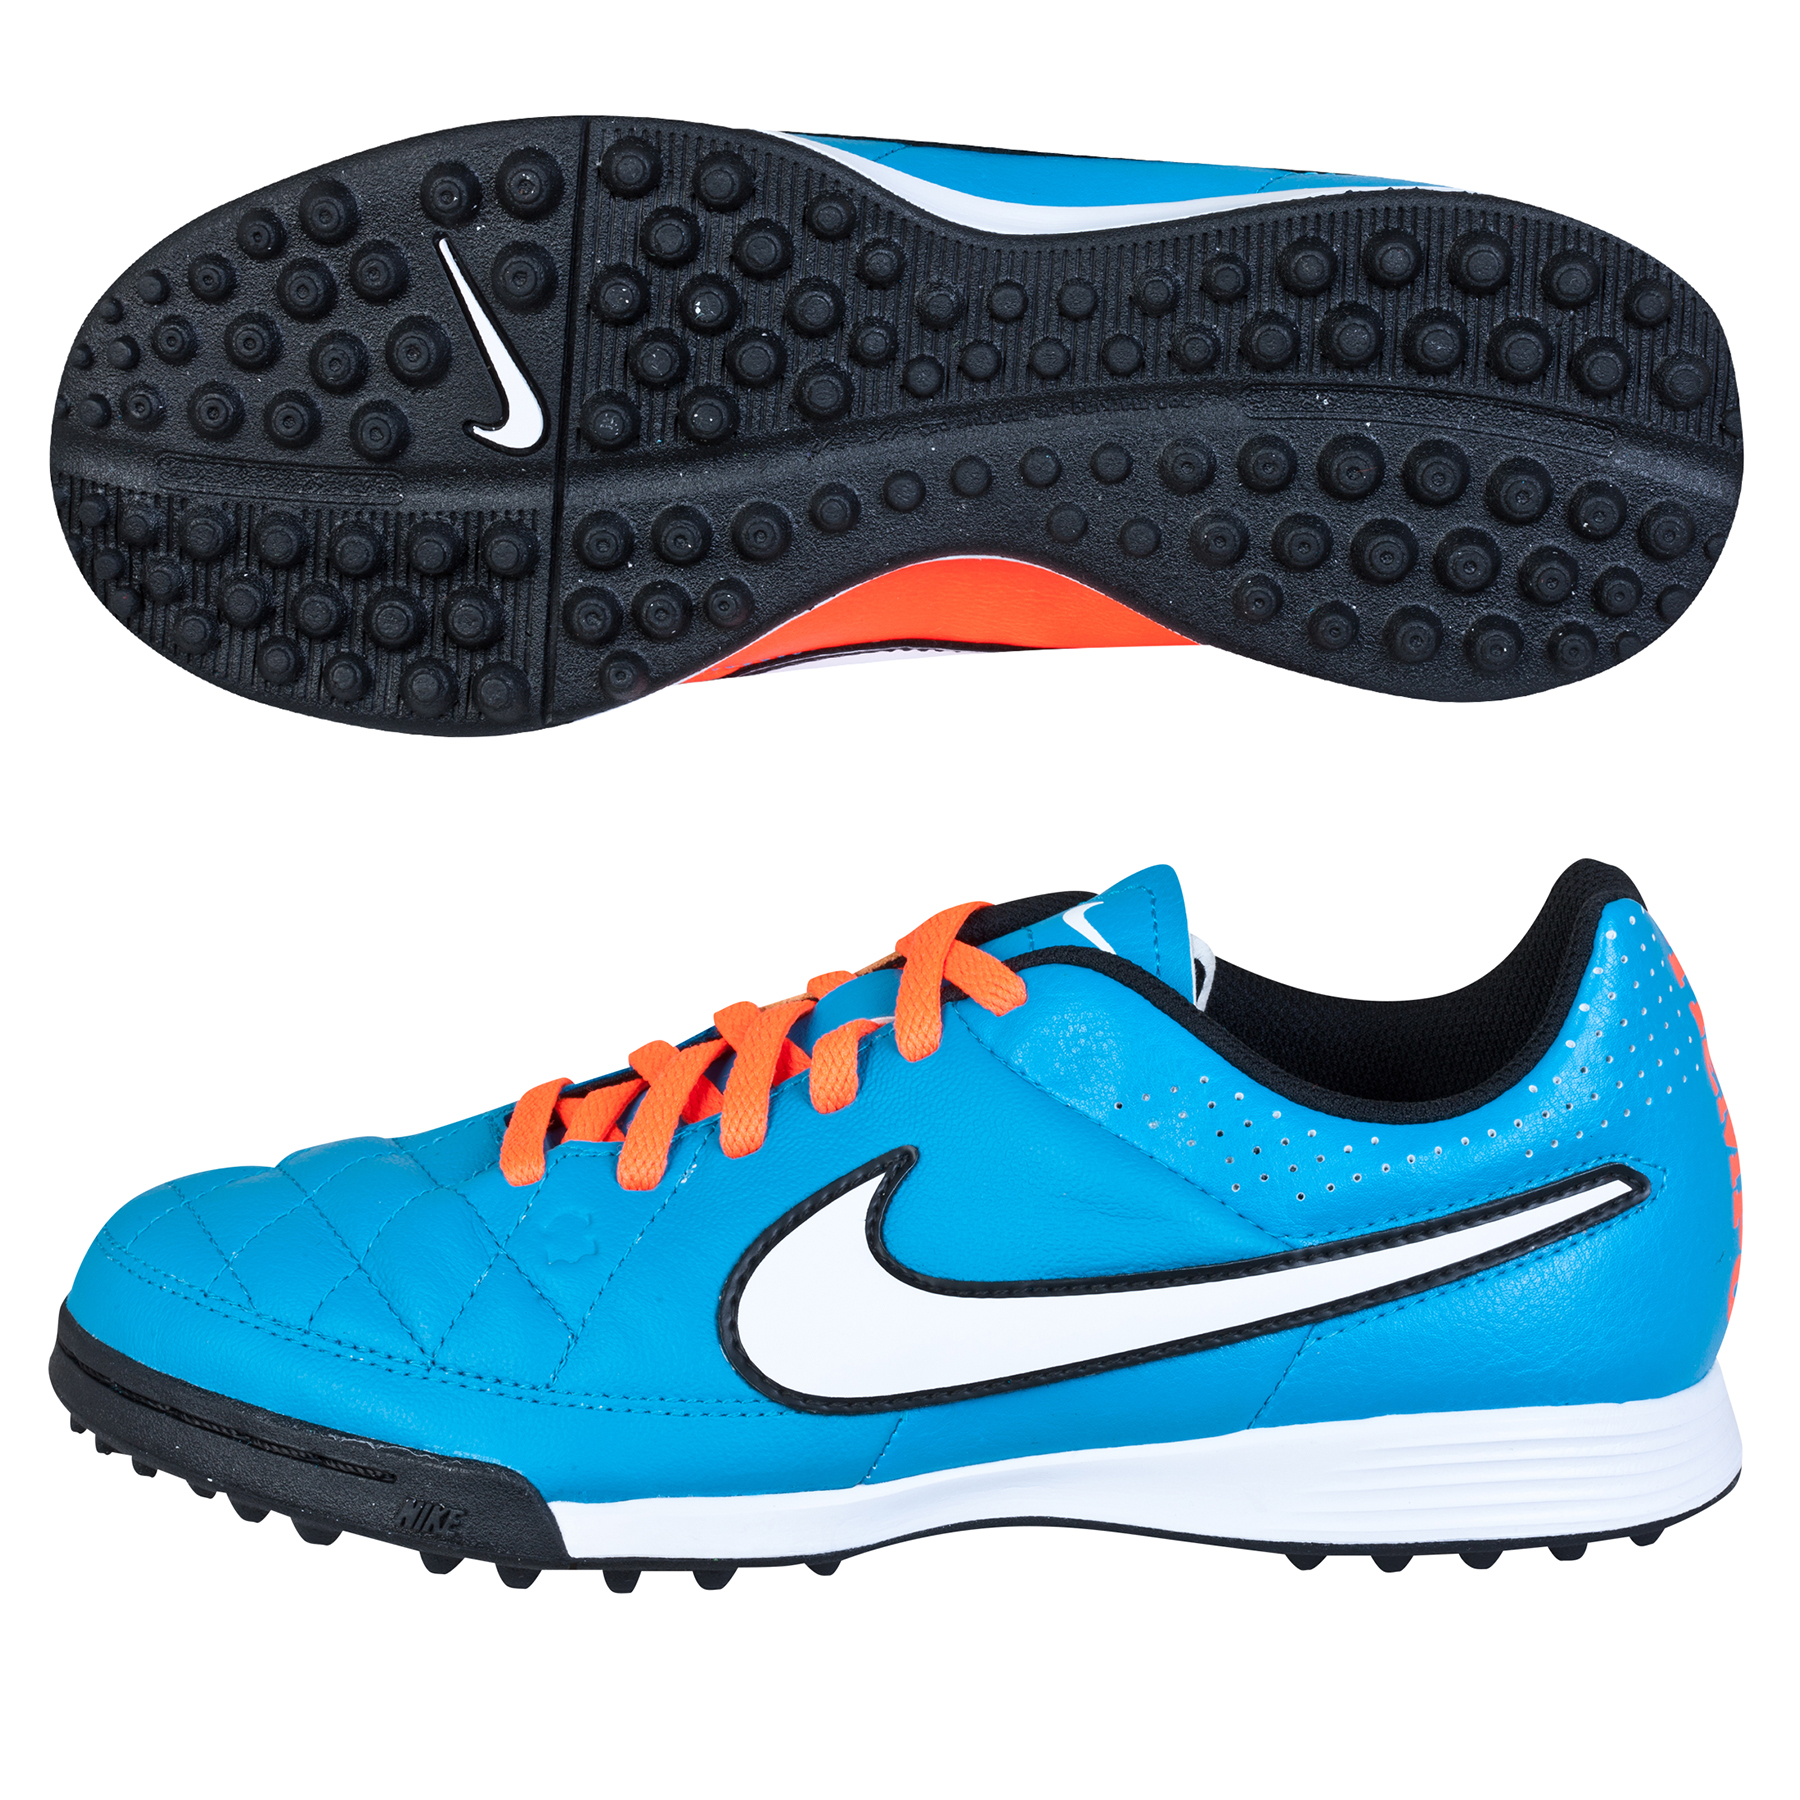 Nike Tiempo Genio Astroturf Trainers - Kids Sky Blue